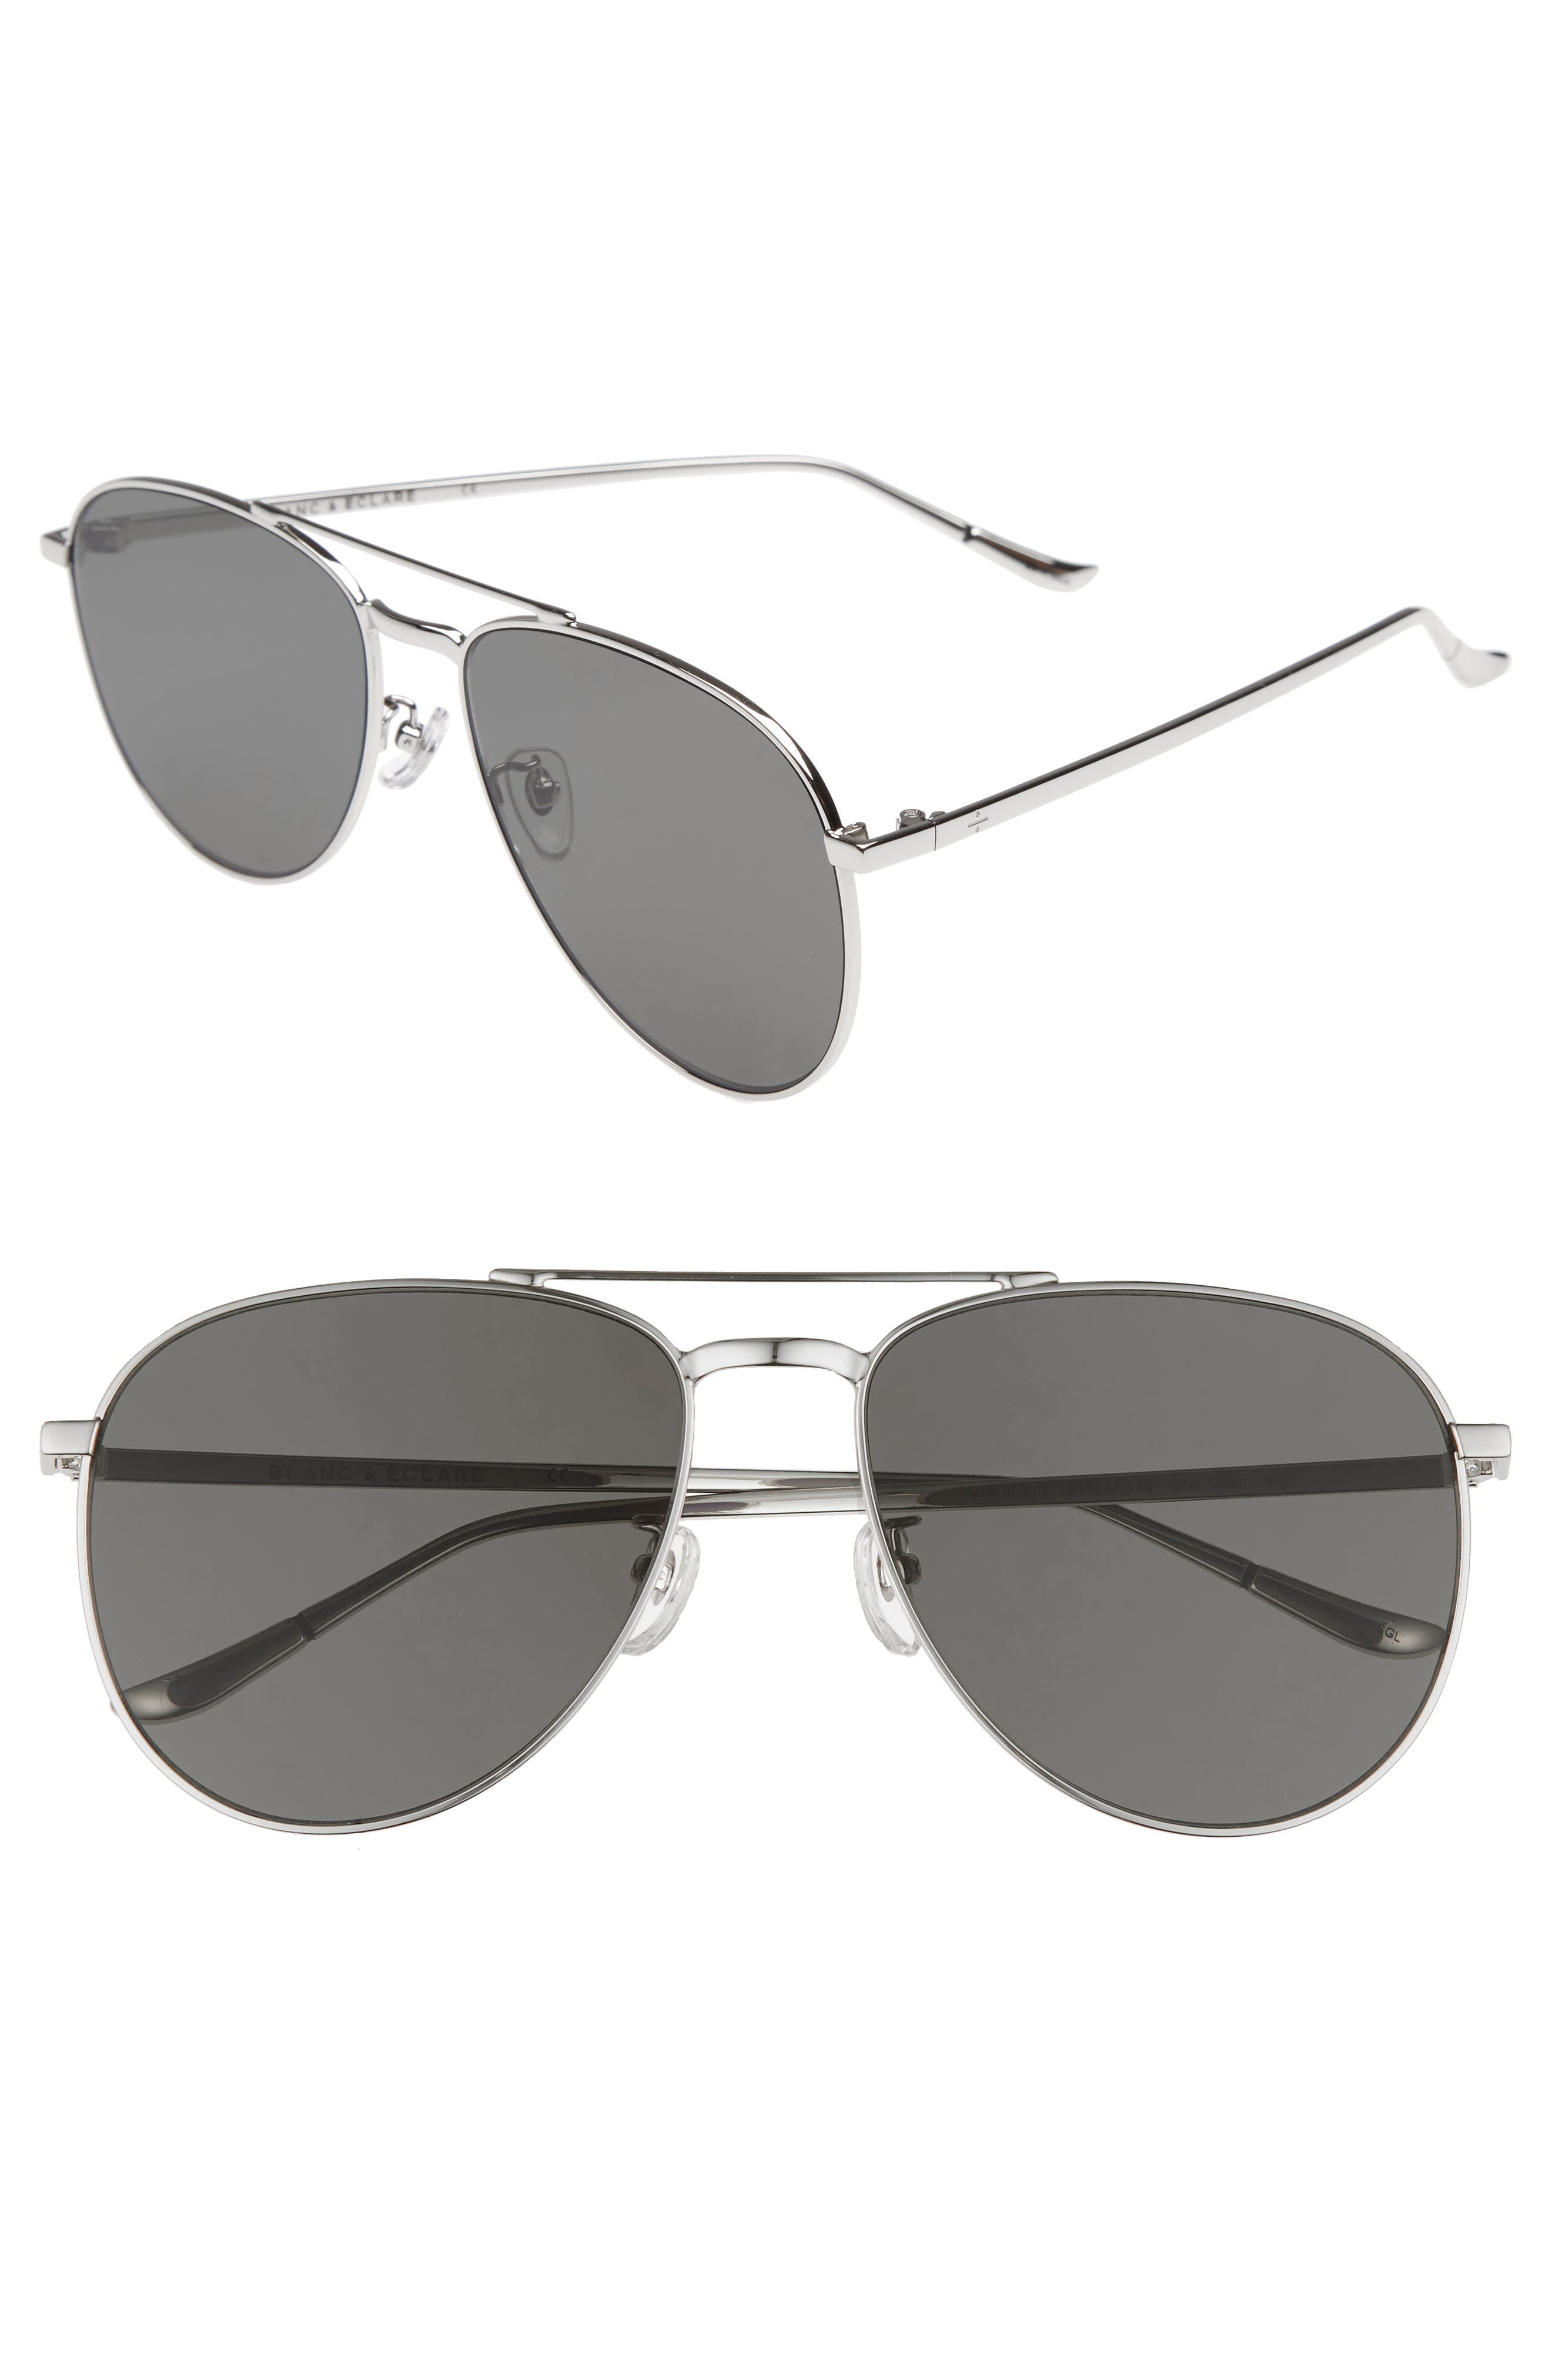 BLANC & ECLARE Miami 61mm Large Polarized Aviator Sunglasses,                         Main,                         color, Silver/ Grey